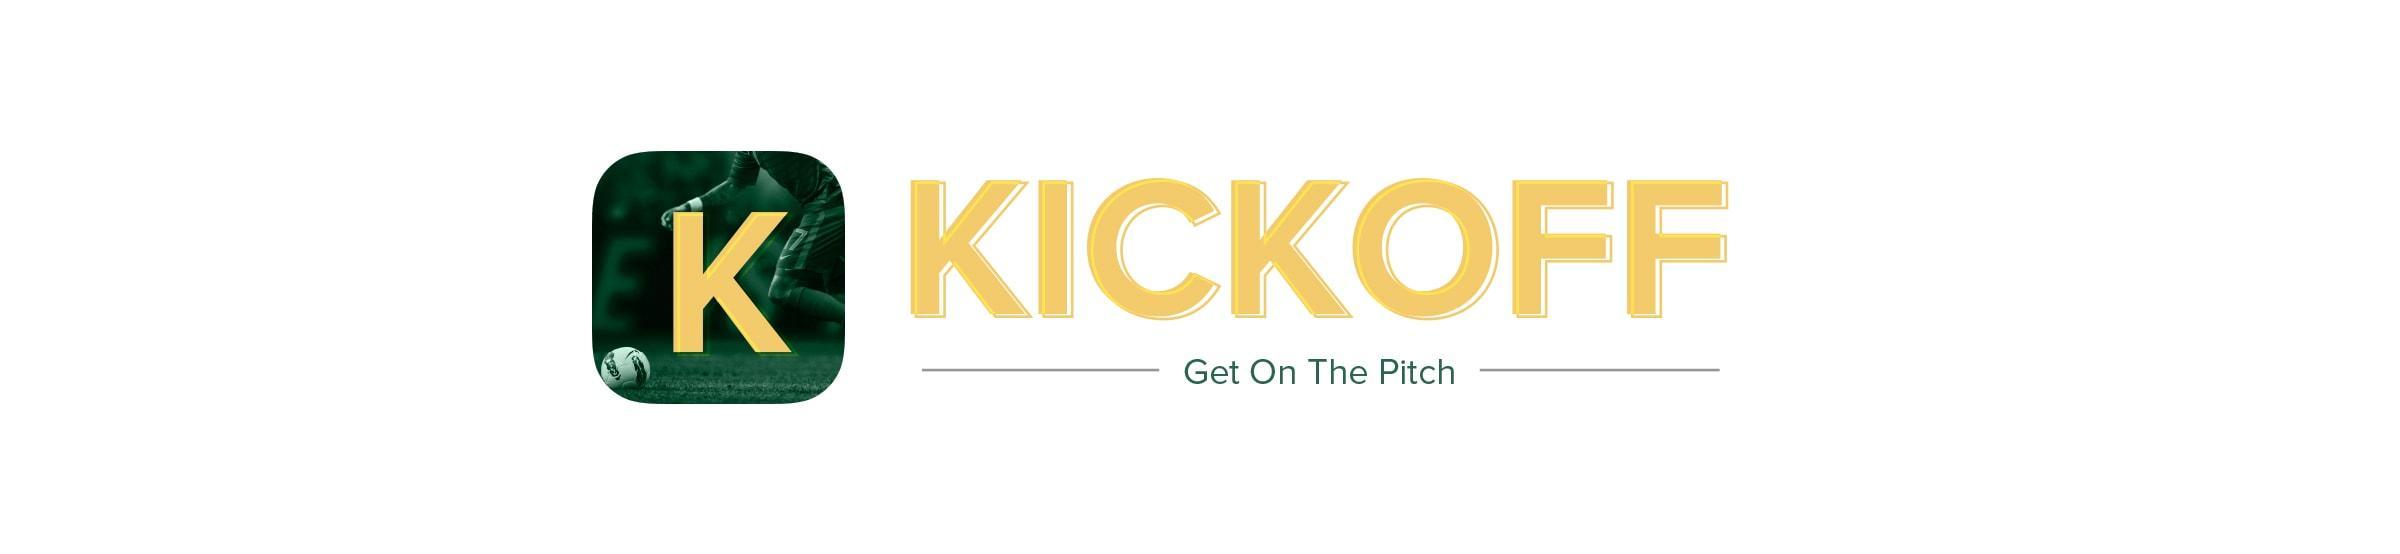 Kickoff-logo-icon-min